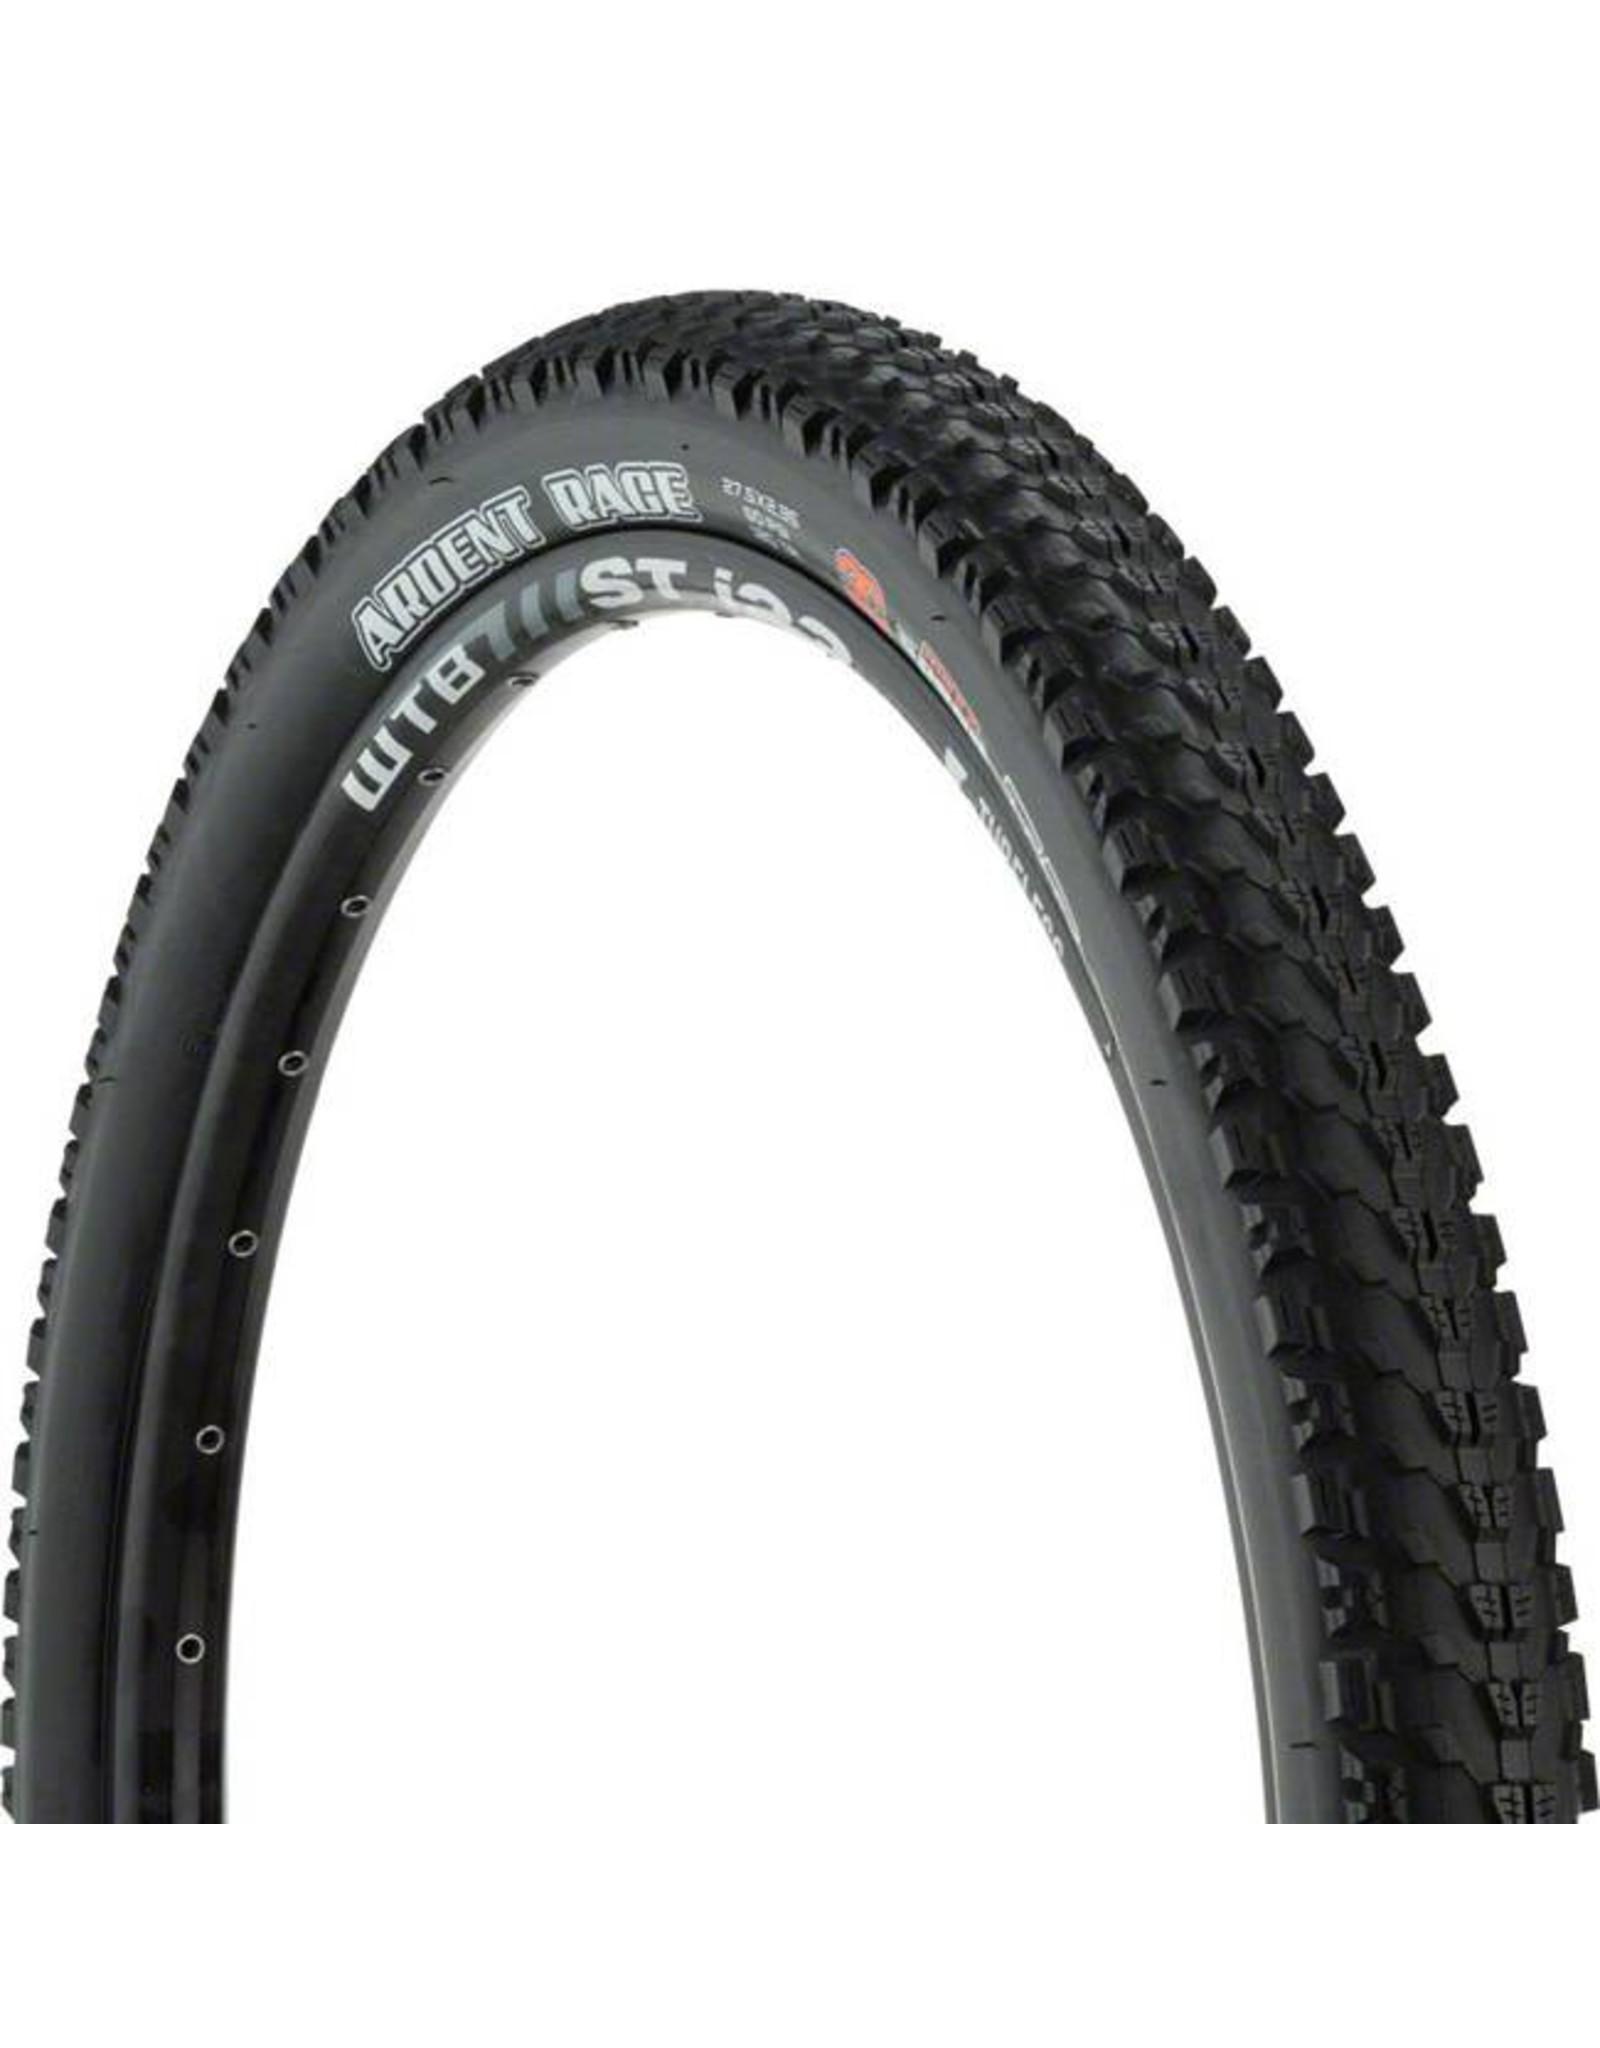 "Maxxis Maxxis Ardent Race Tire: 27.5 x 2.35"", Folding, 120tpi, 3C, Tubeless Ready, Black"